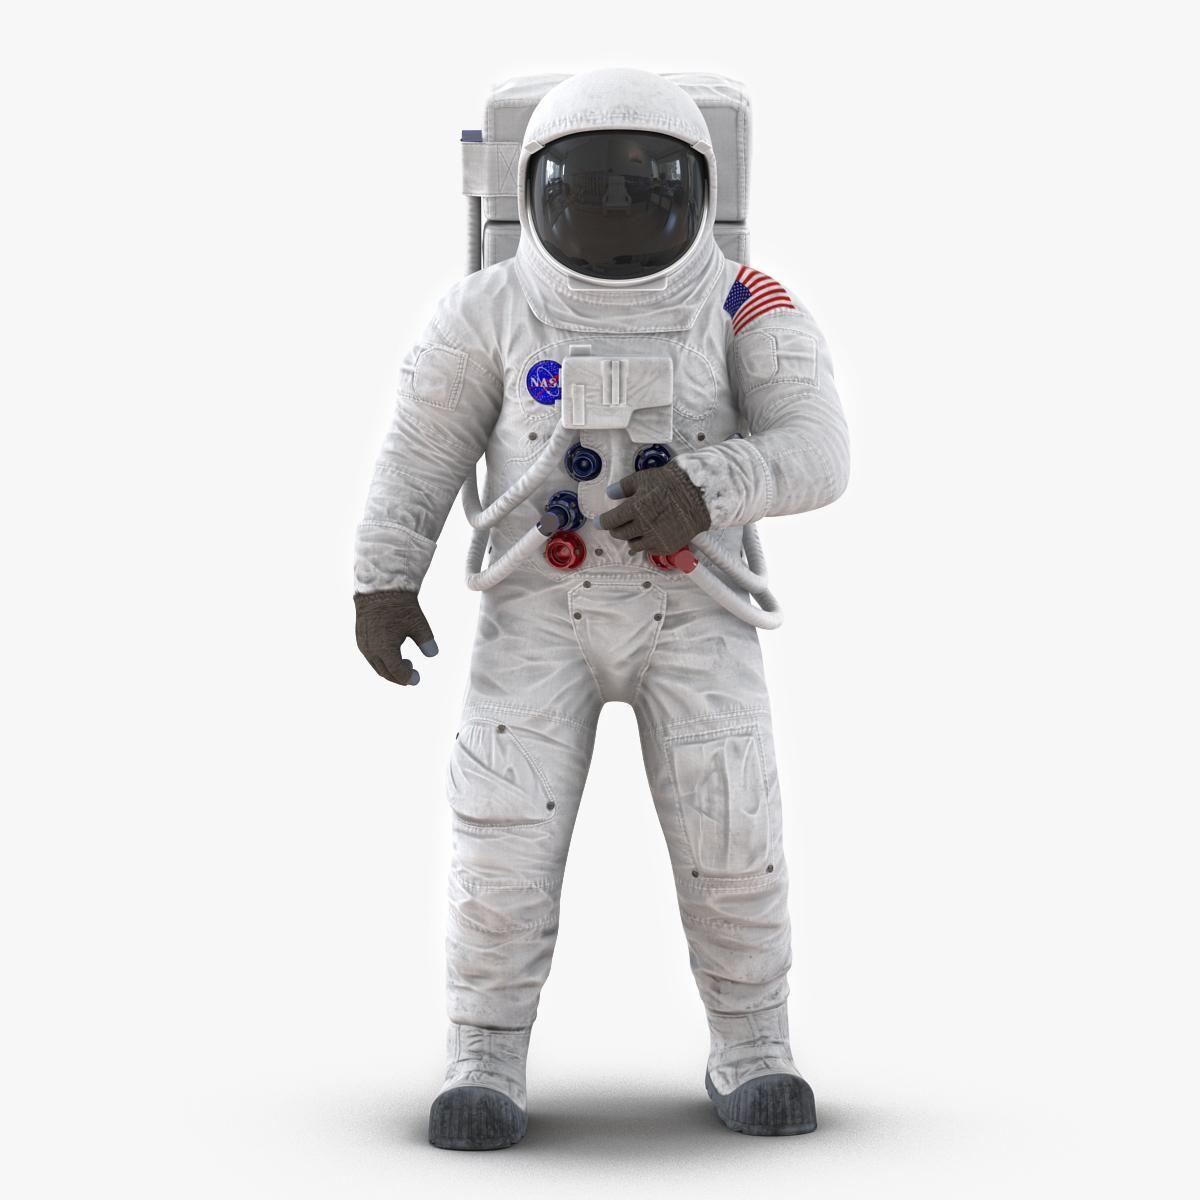 Astronaut Nasa Wearing Spacesuit A7l Pose 2 3d Model Ad Wearing Nasa Astronaut Spacesuit Space Suit Astronaut Nasa